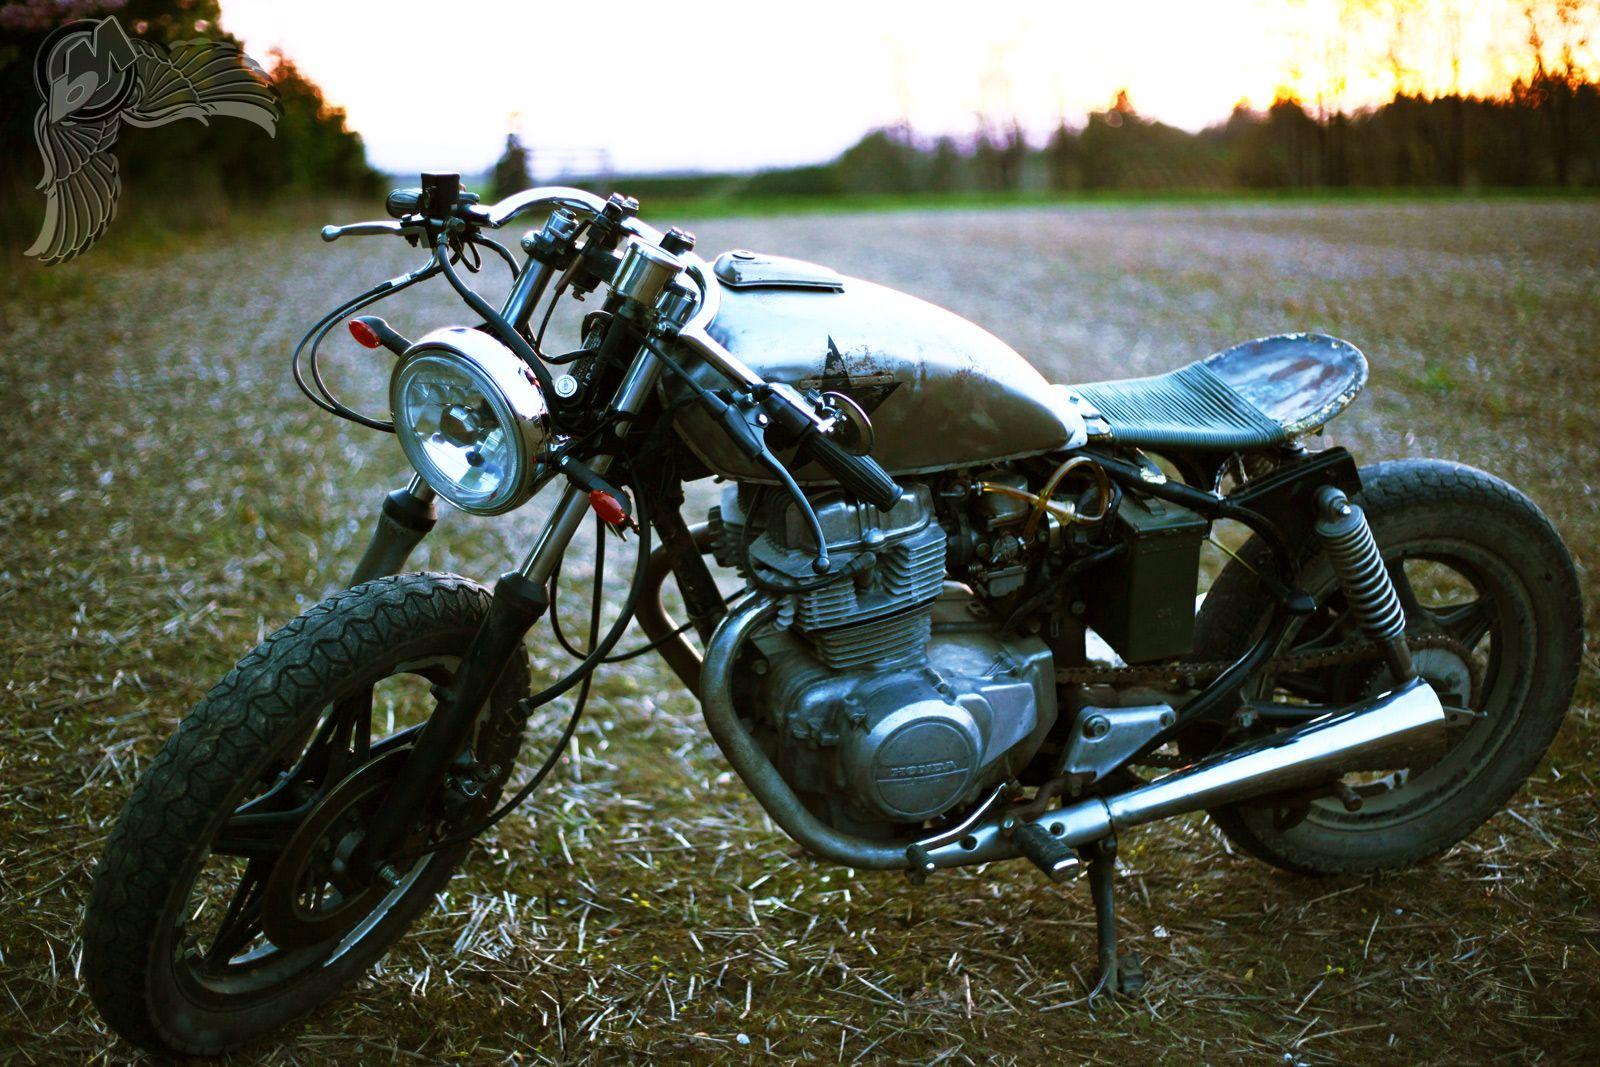 Brat Timeline Photos Facebook Cafe Racer Bikes Brat Bike Motorcycle